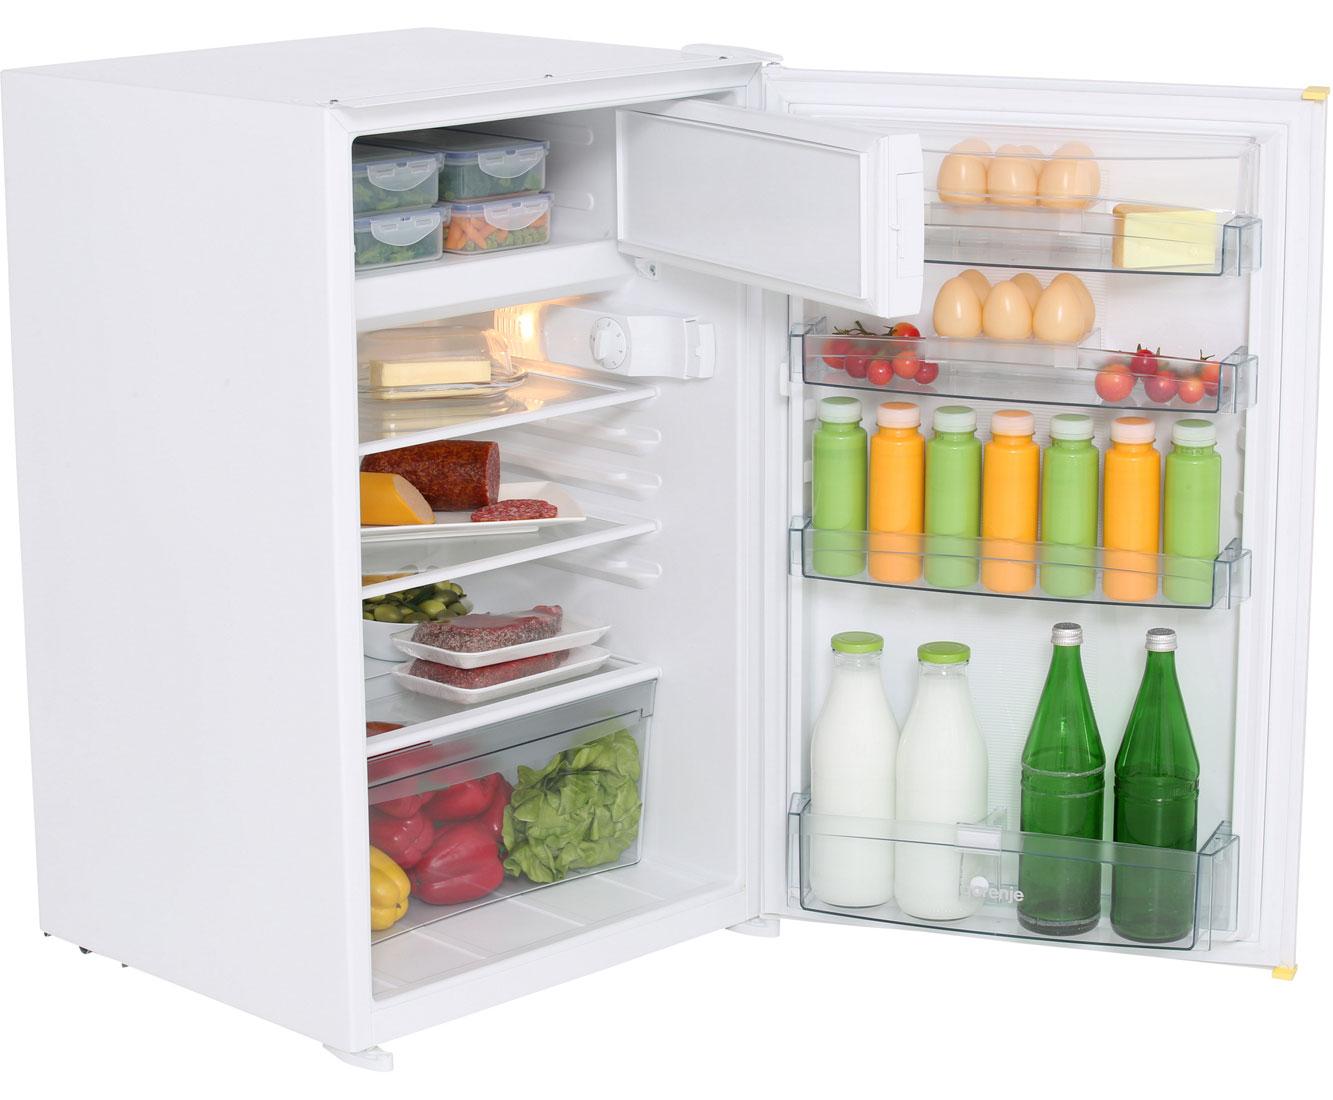 Kühlschrank Groß : Liebherr gemüseschale kühlschrank groß liebherr ab